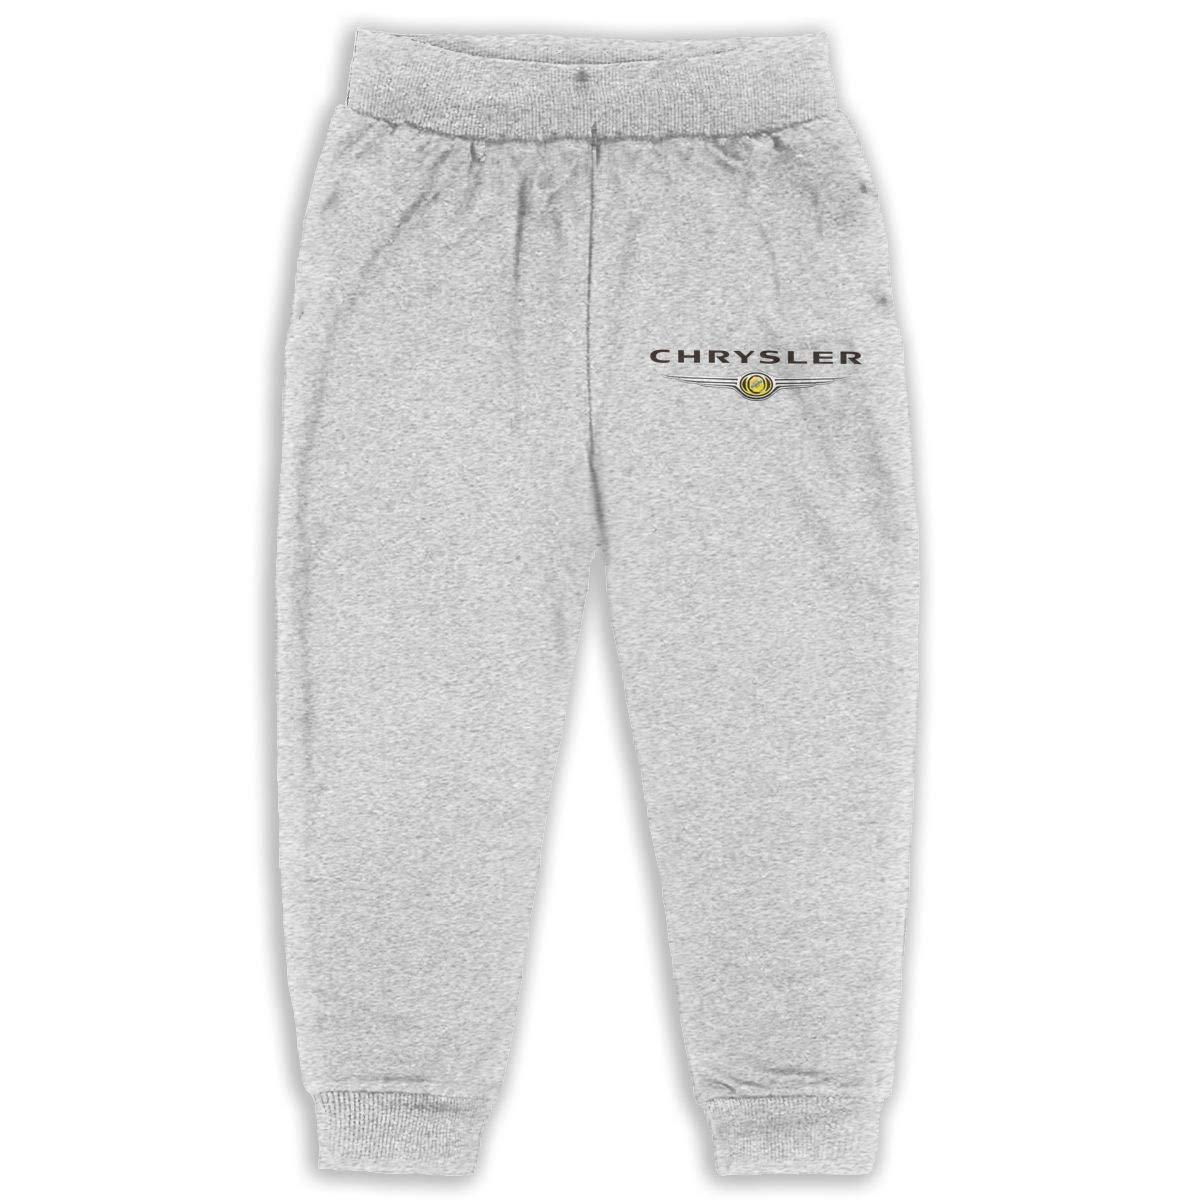 NEST-Homer Childrens Sweatpants Chrysler Car Logo Boys and Girls Jogger Long Pants Sweatpants Leggings